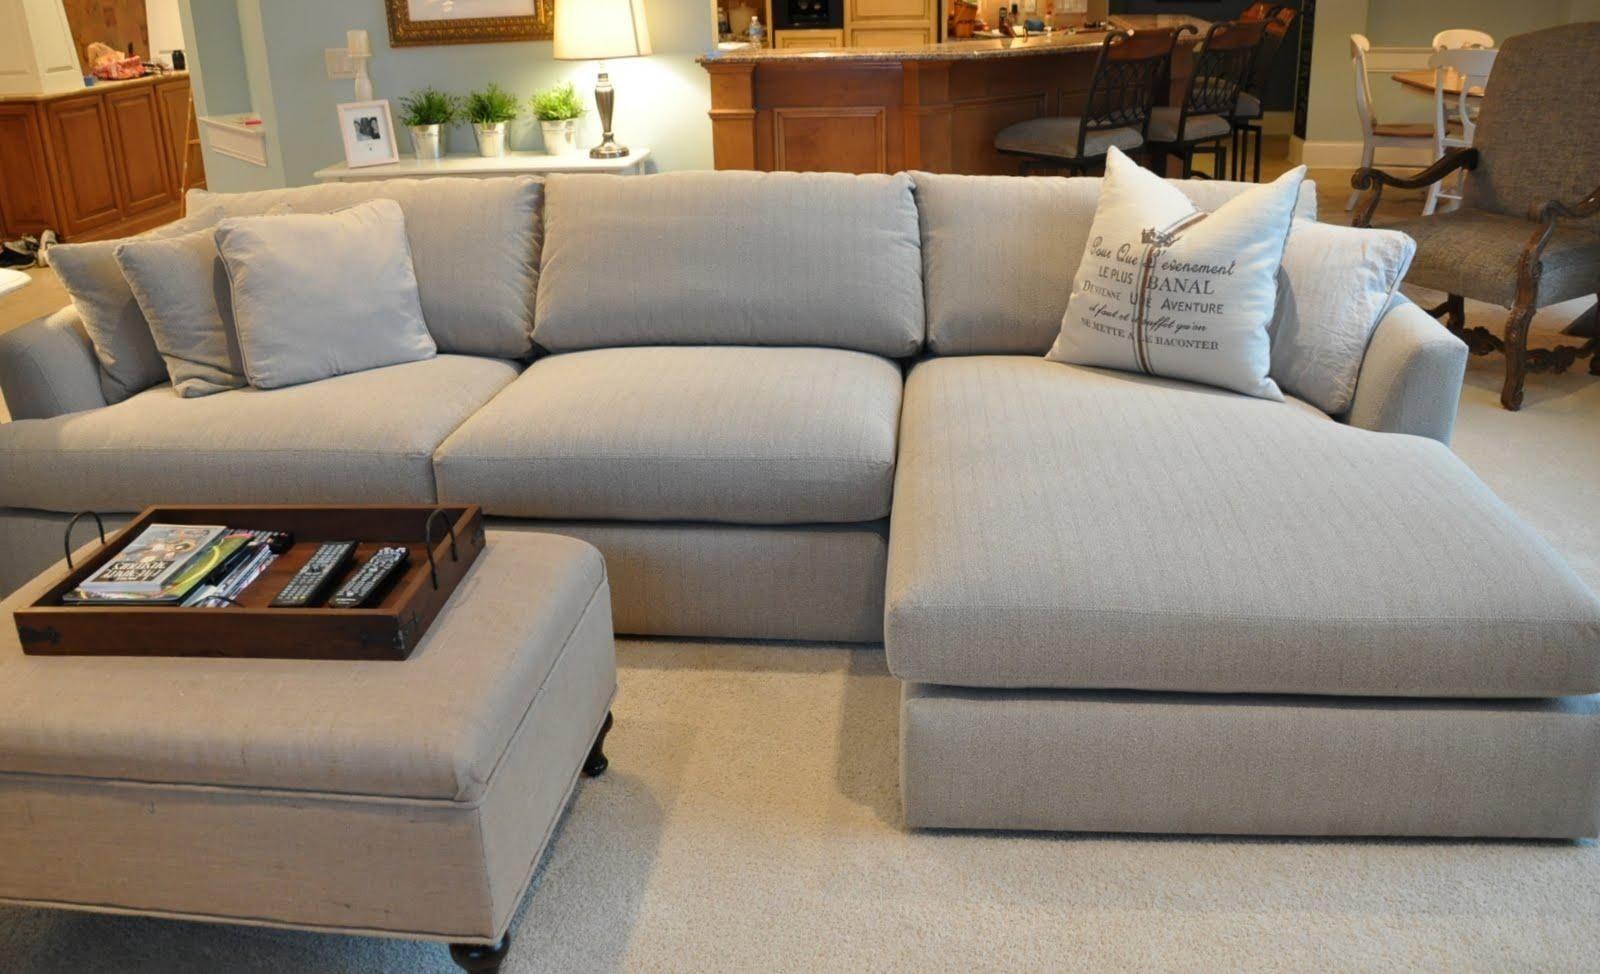 Decorate Deep Sectional Sofa With Pillows Deep Sectional Sofa Sectional Sofa With Chaise Deep Sofa